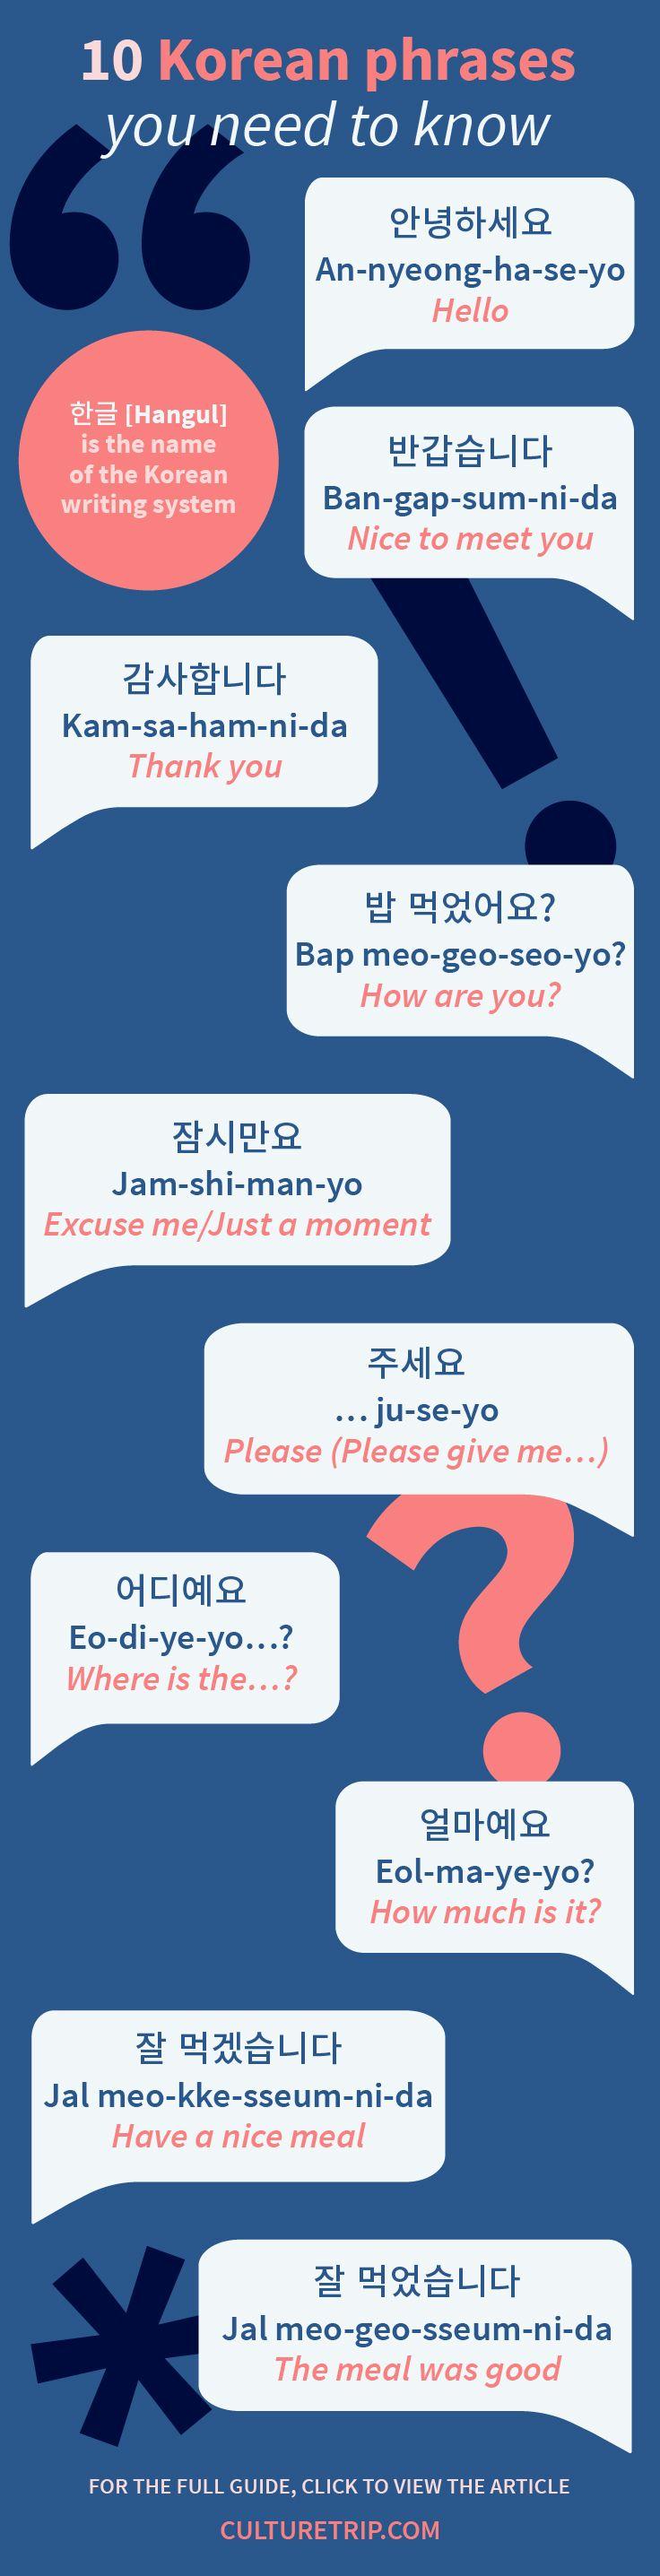 15 Korean Phrases You Need to Know | South Korea, Seoul, Hangul, weekend break, Asia, bucket list, wanderlust, adventure, challenge, coffee, bar, food, must try, Summer, Tea, Ankara, learning, language, greetings, basic